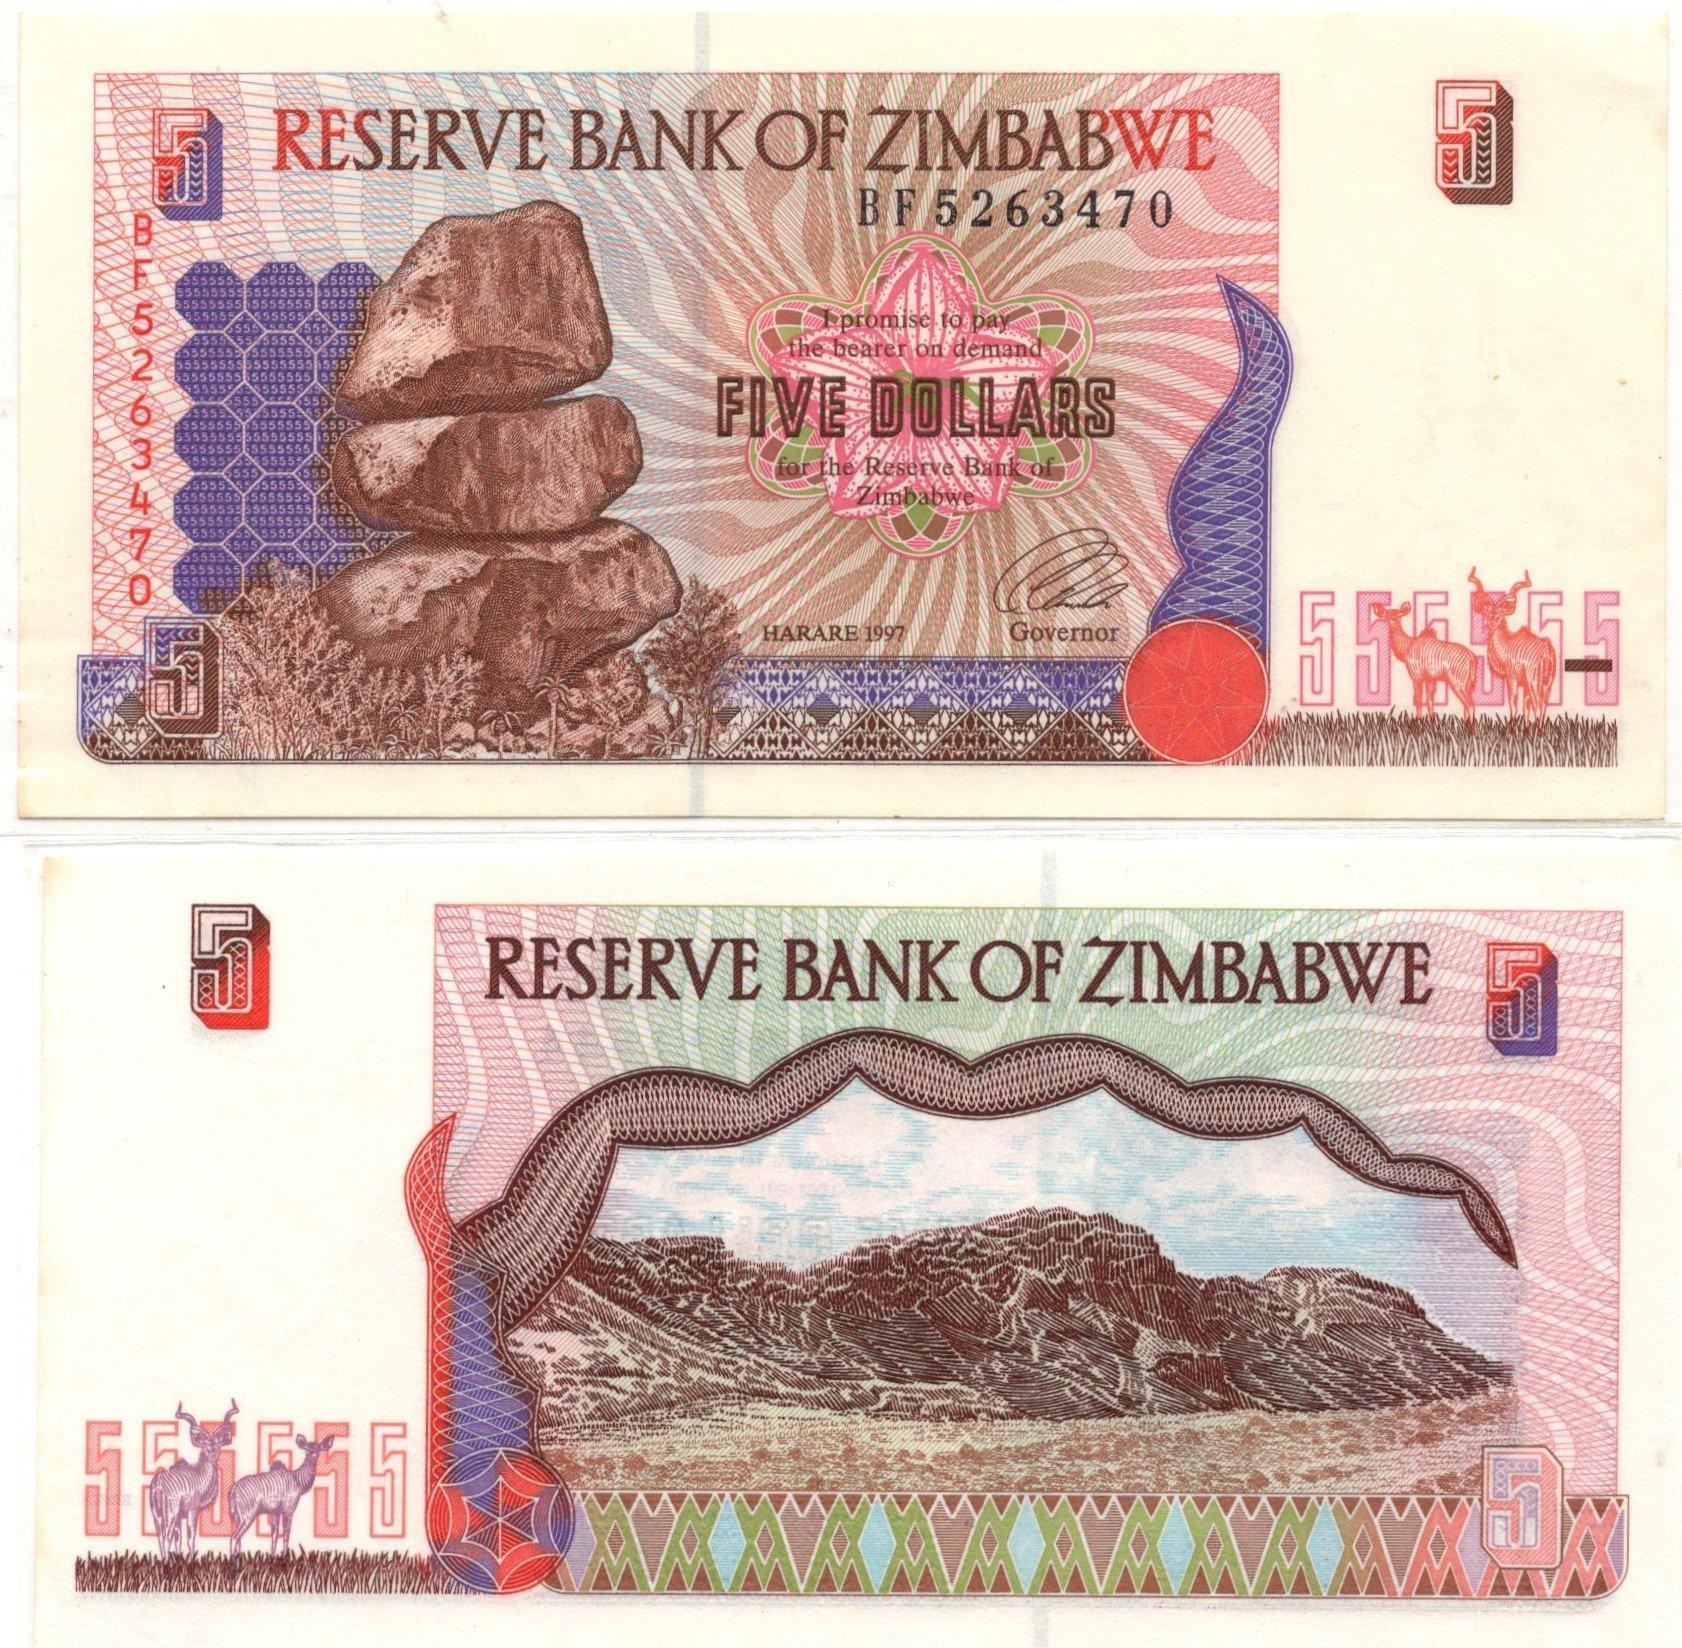 Zimbabwe 5 dollars 1997 banknote